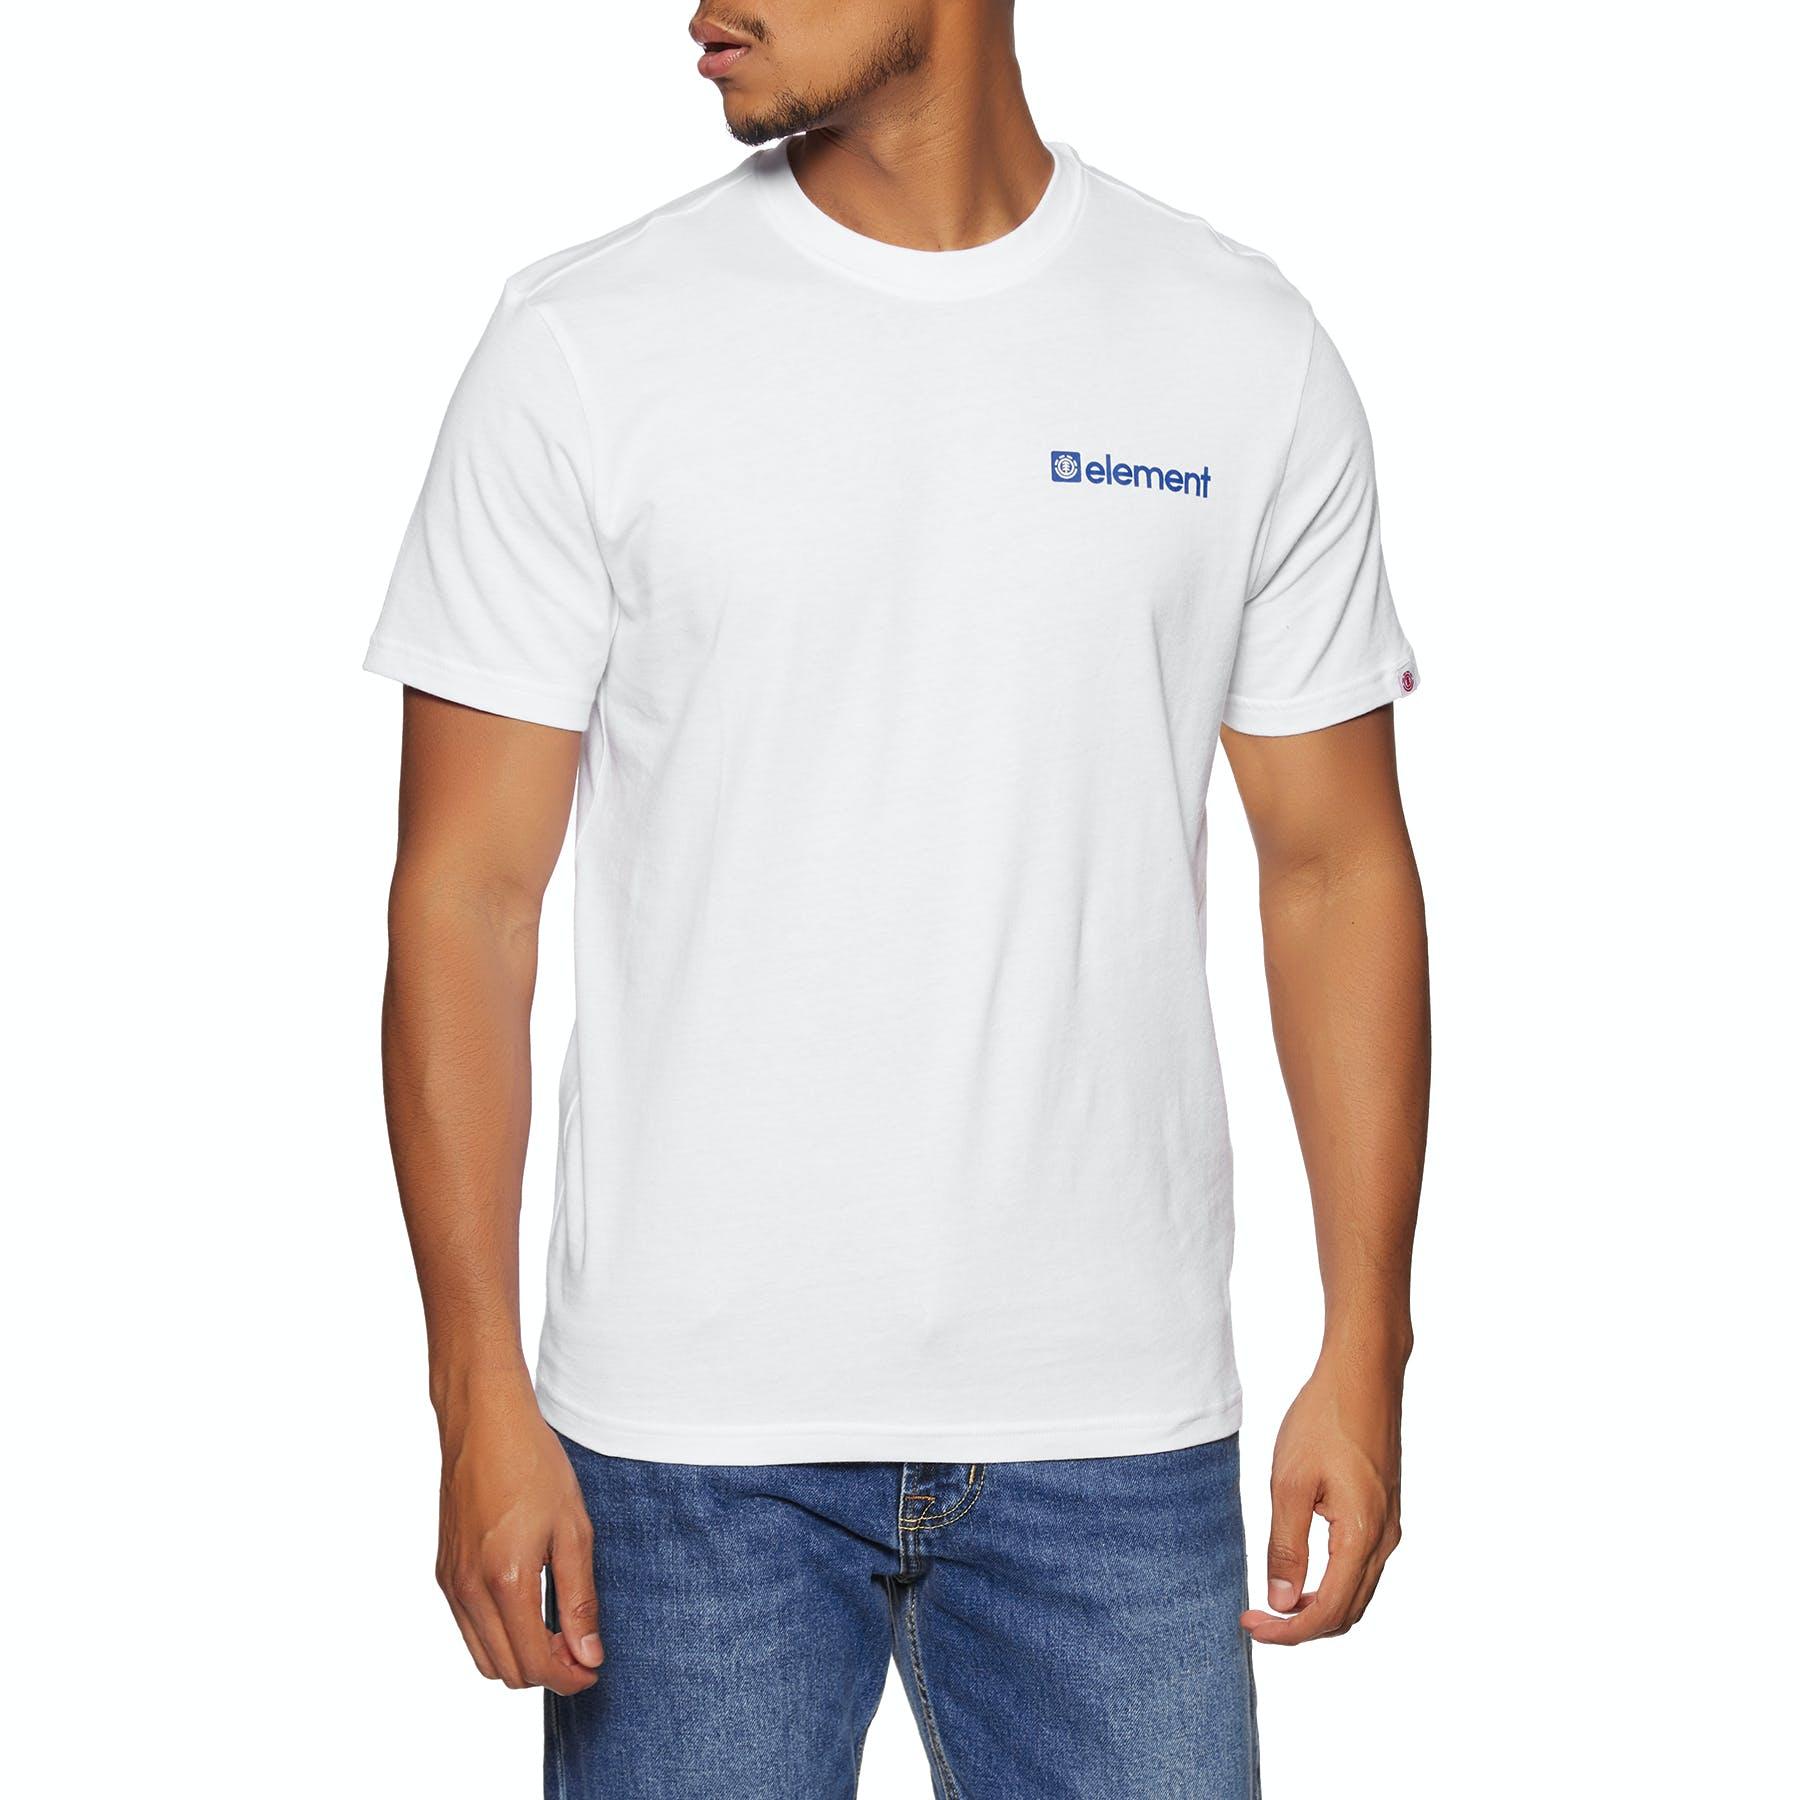 Element Mizu Short Sleeve T-Shirt in Optic White